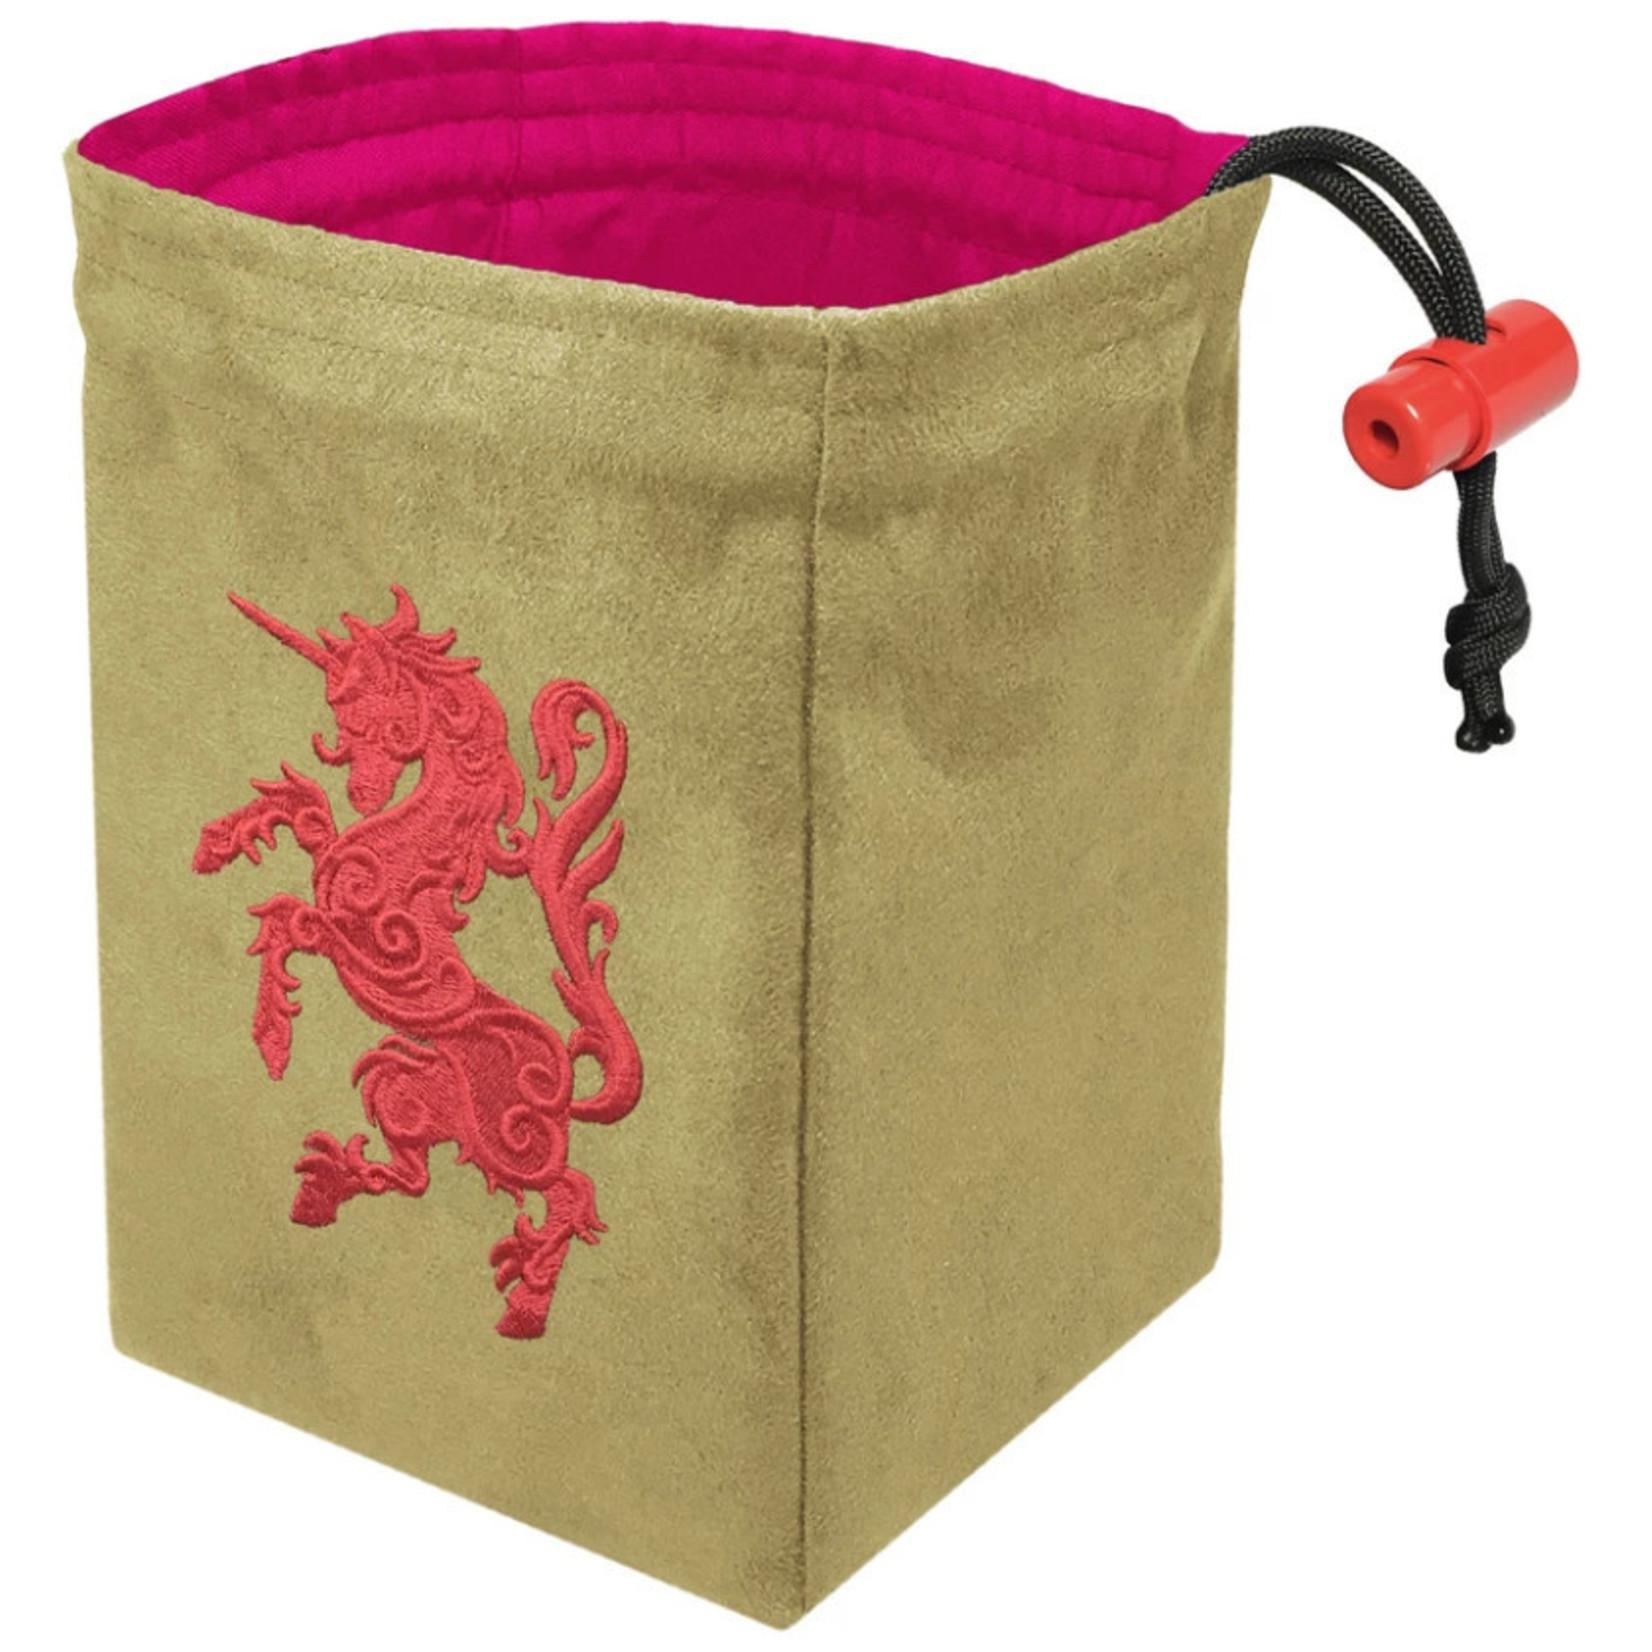 Red King Dice Bag: Gilded Neon Unicorn